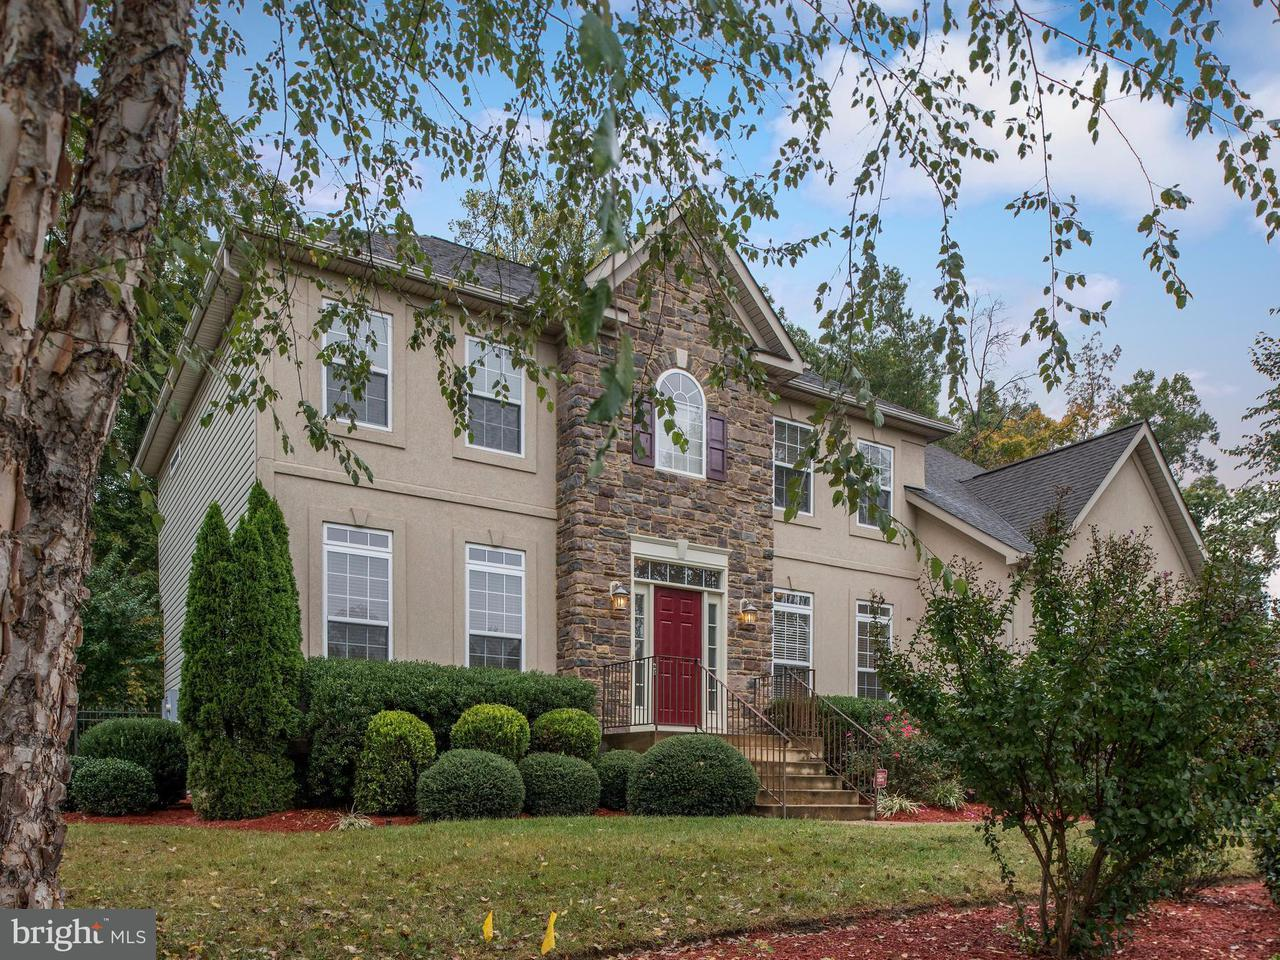 3809  Chapman Fredericksburg, VA 22408